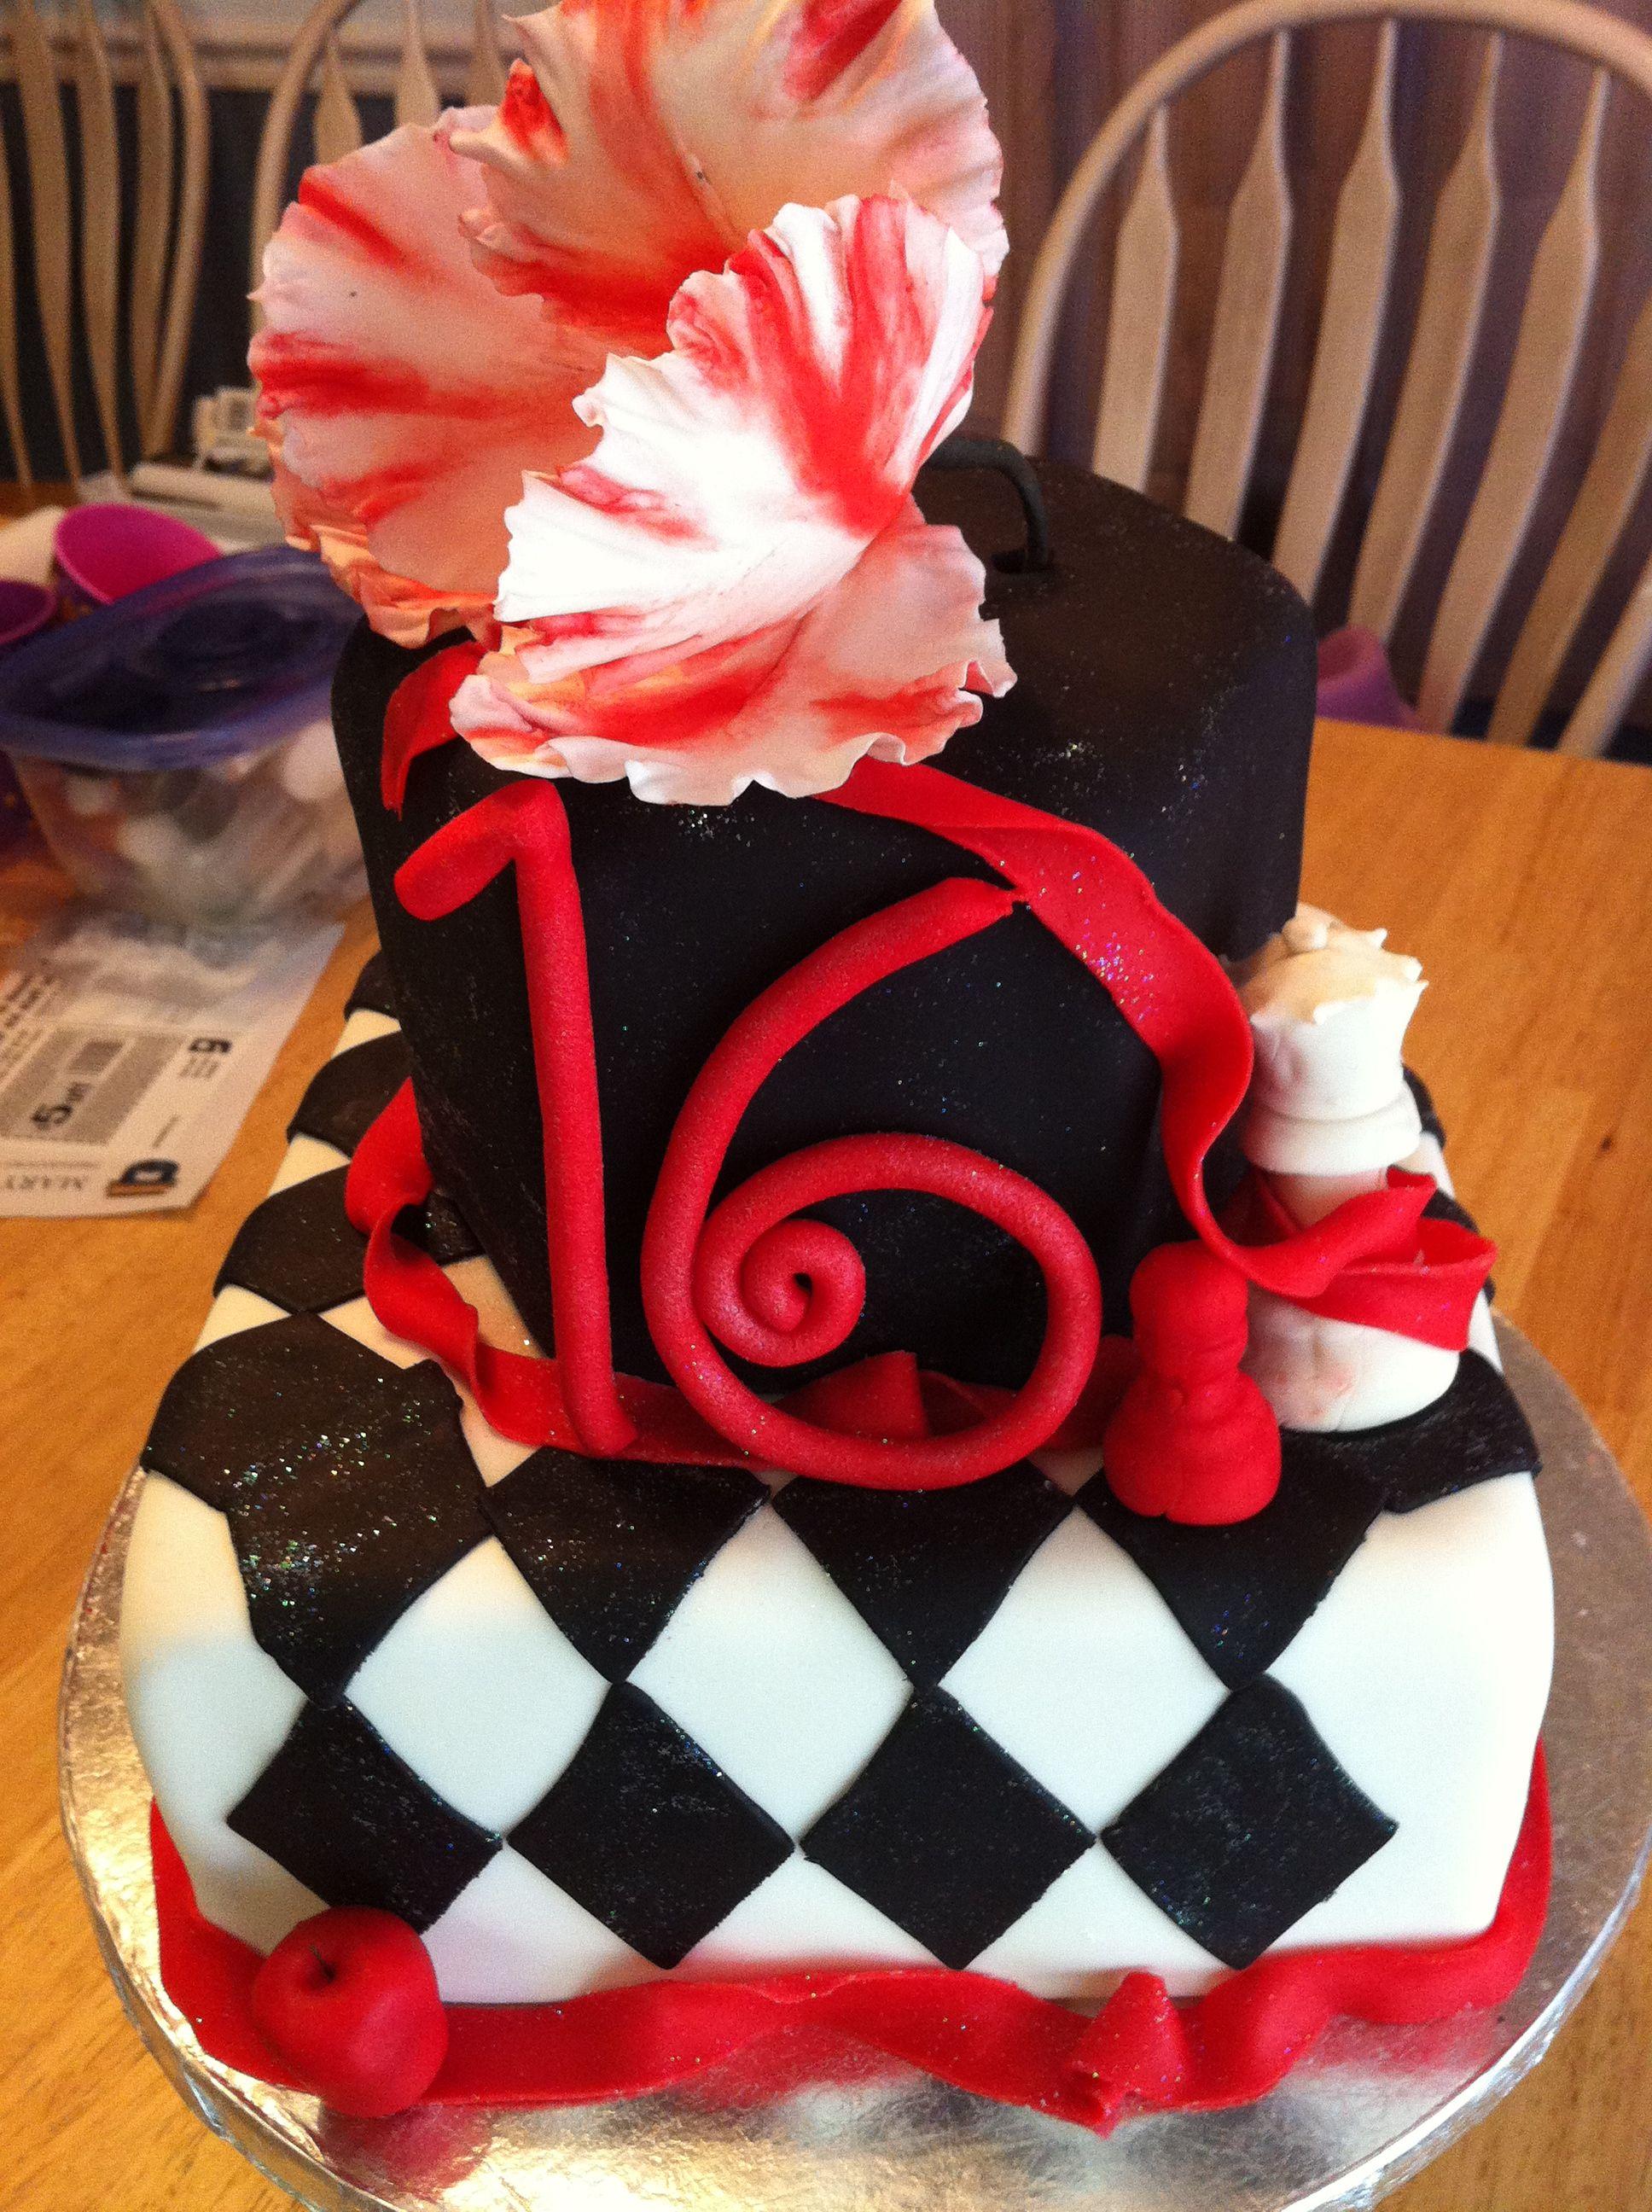 Twilight 16th Birthday Cake